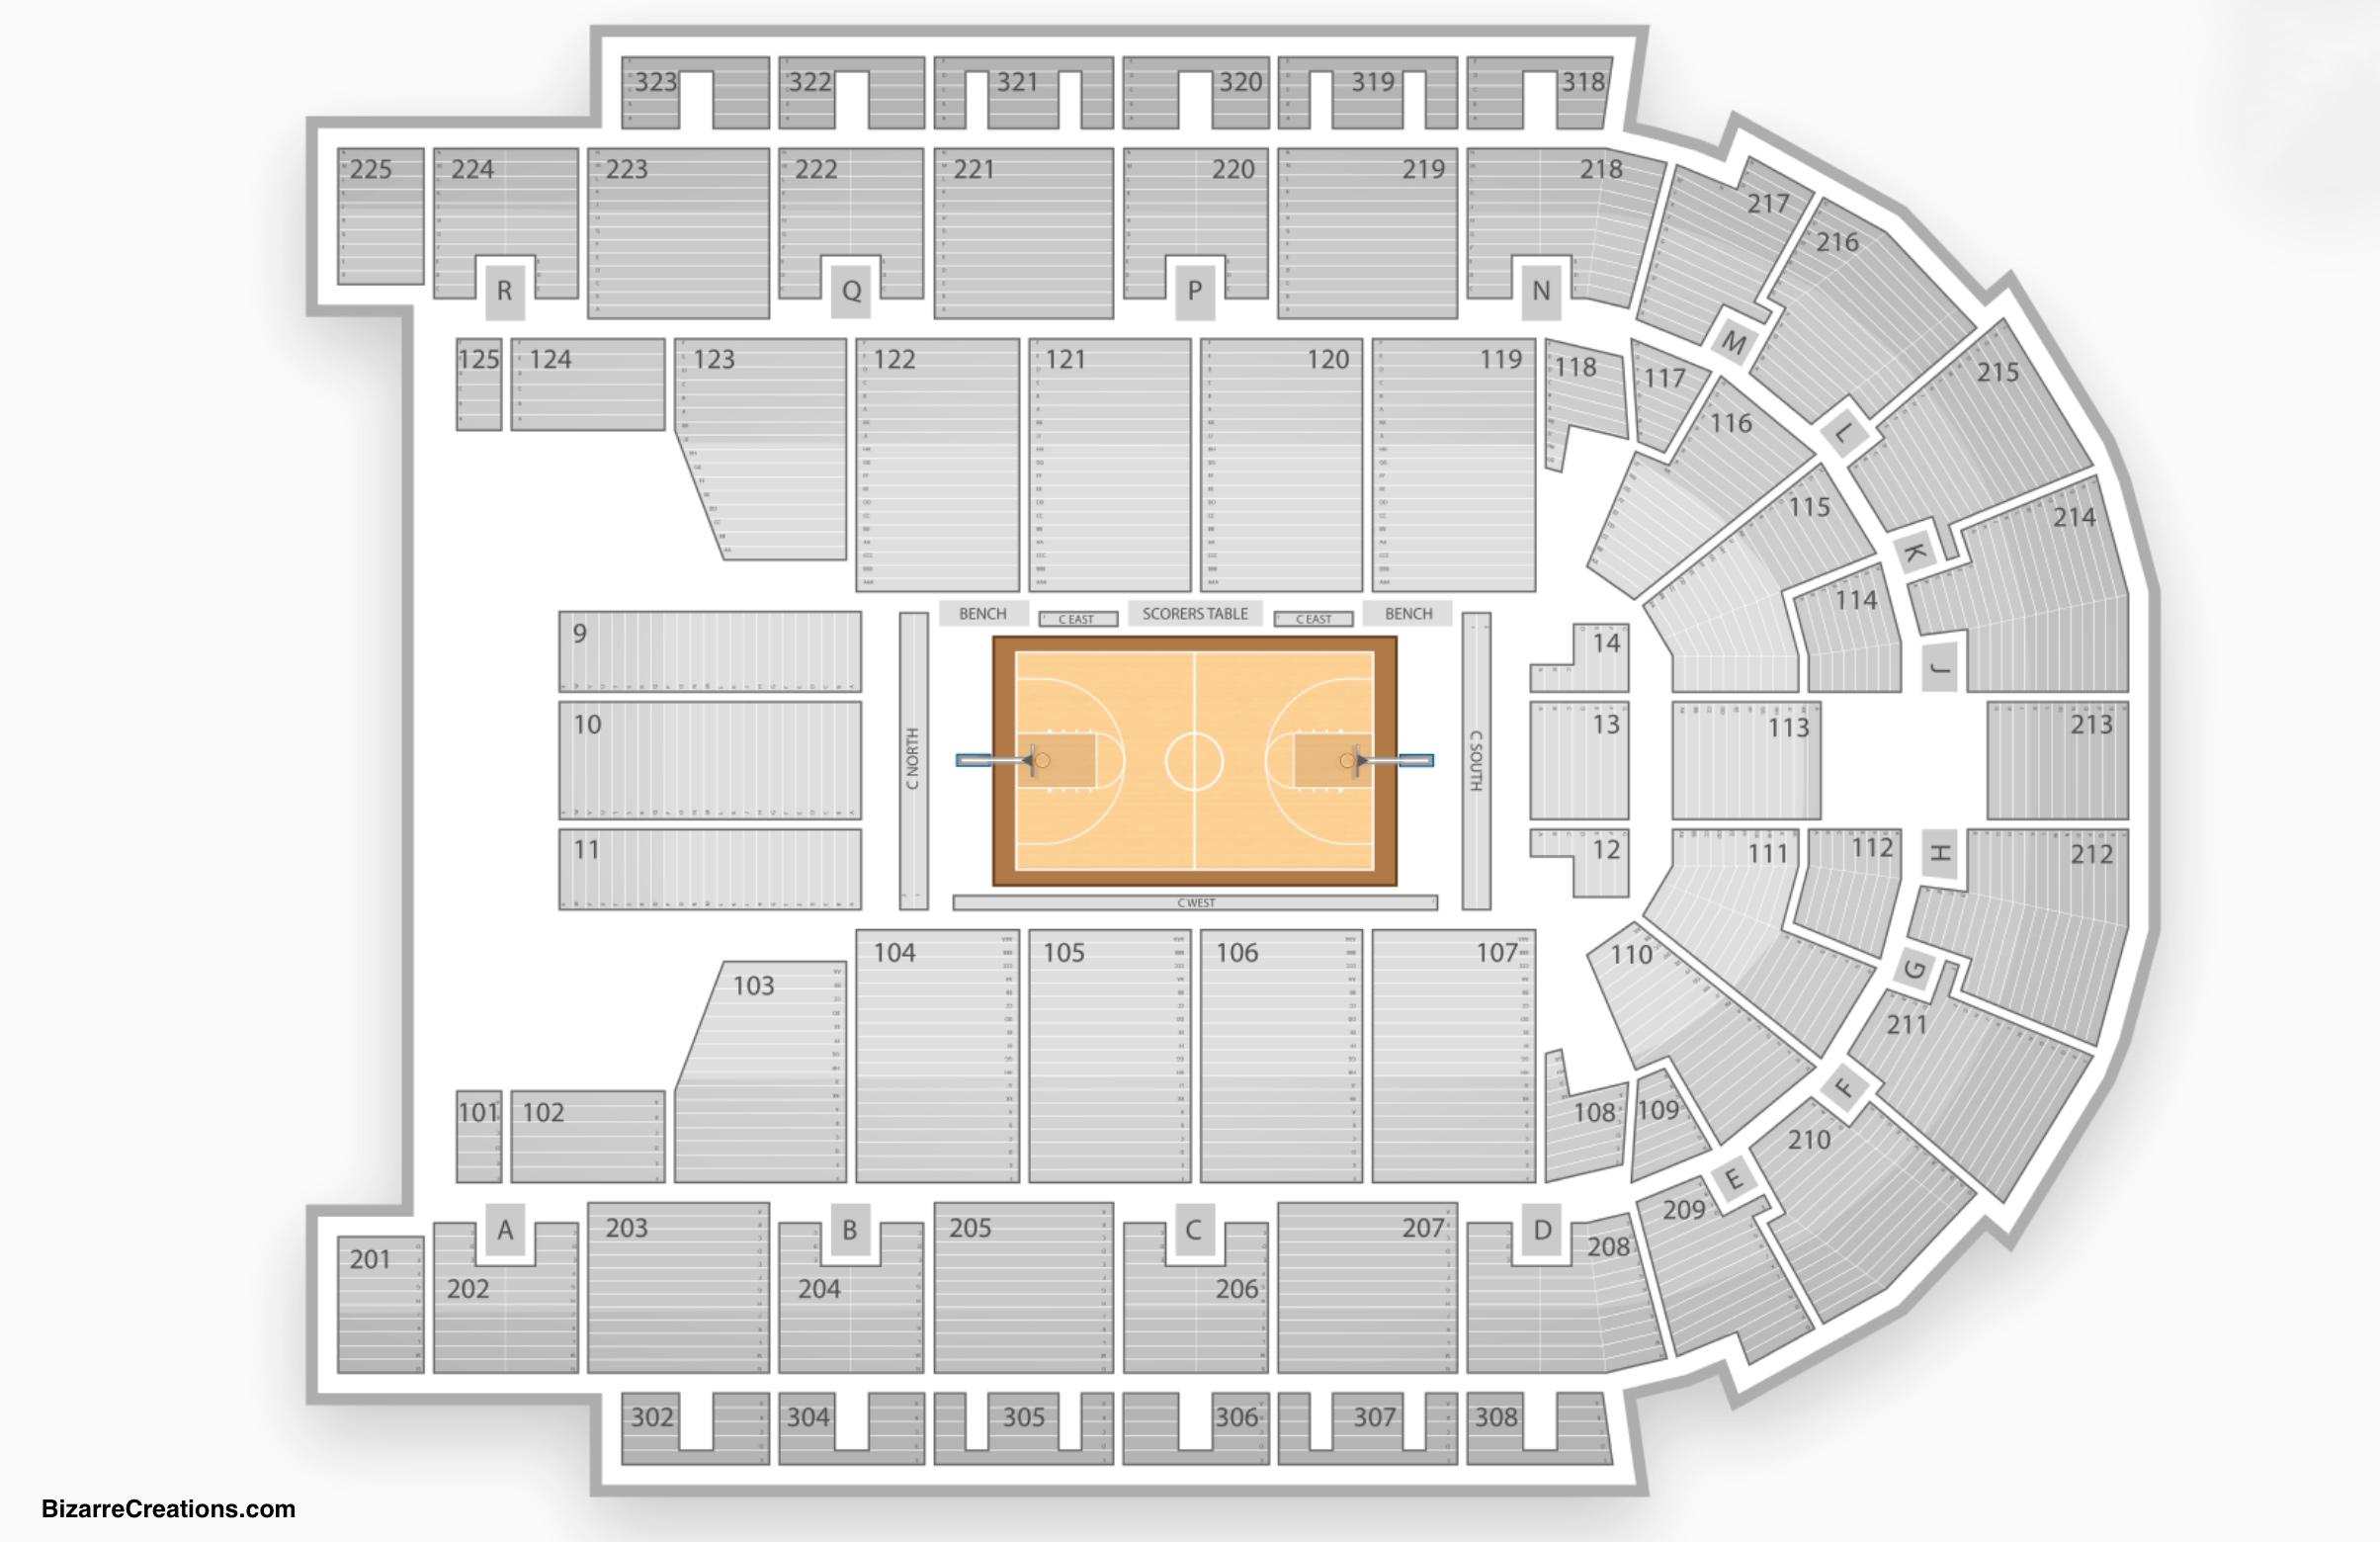 Philadelphia 76ers Seating Chart